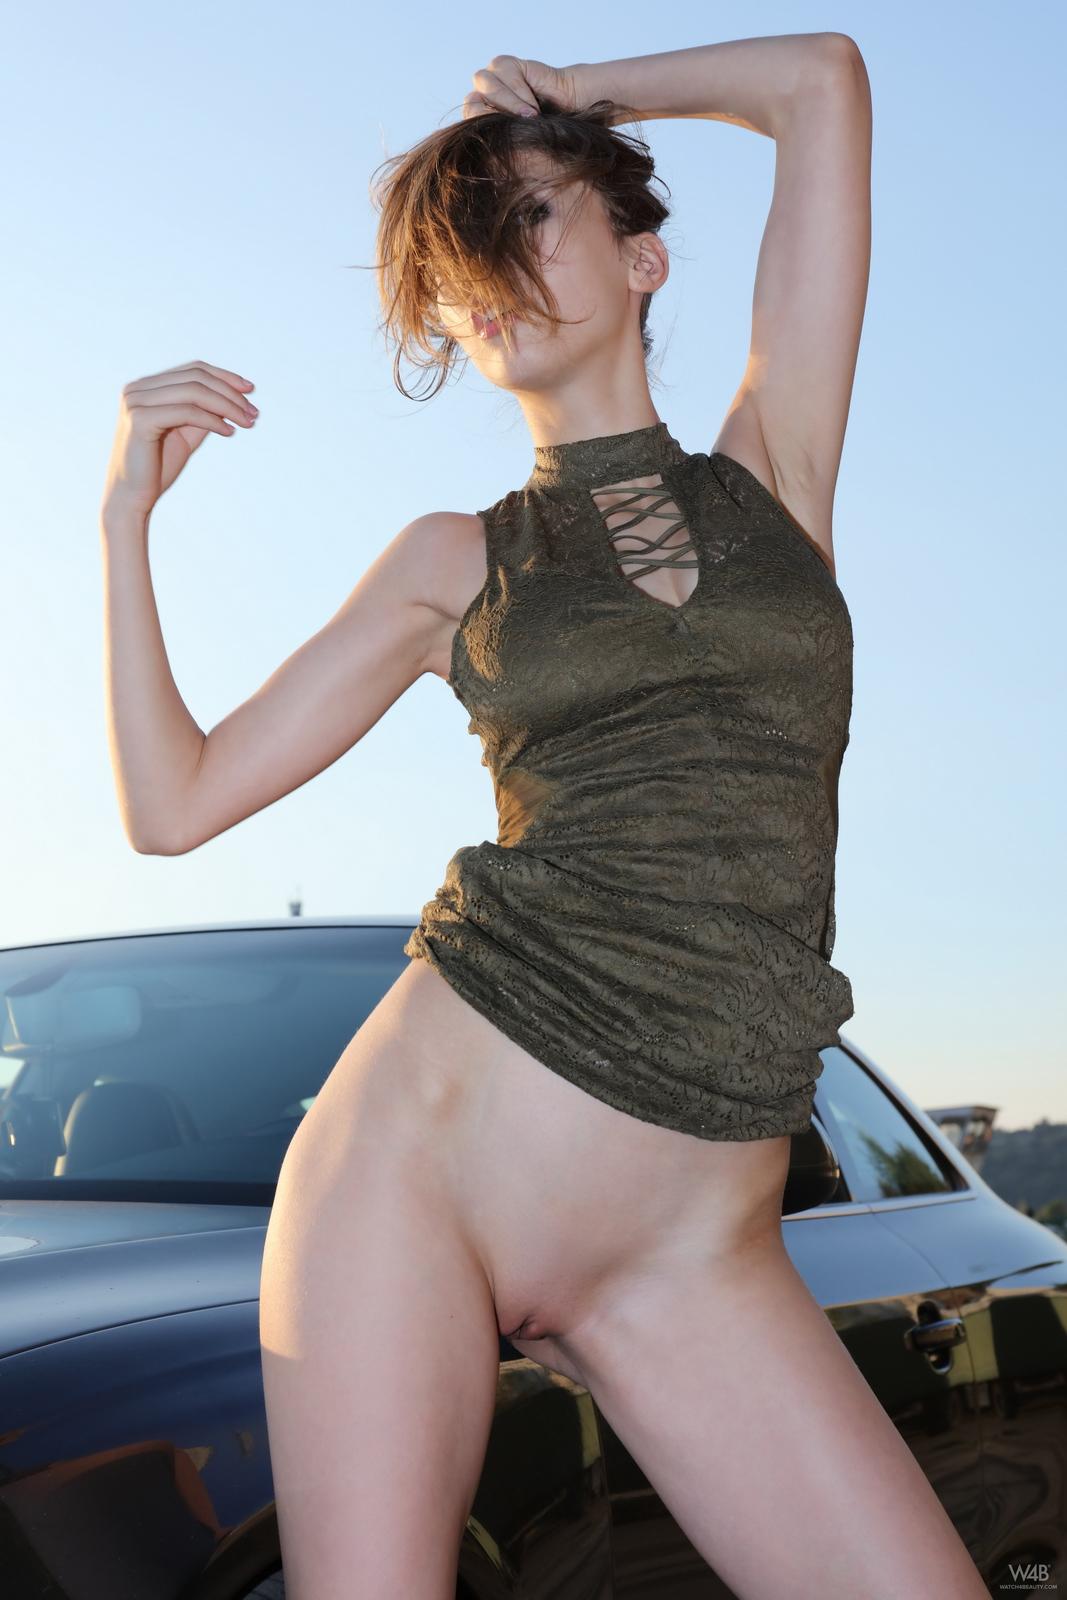 https://redbust.com/stuff/mila-azul-audi-rs5/milla-nude-audi-rs5-cars-pussy-watch4beauty-18.jpg